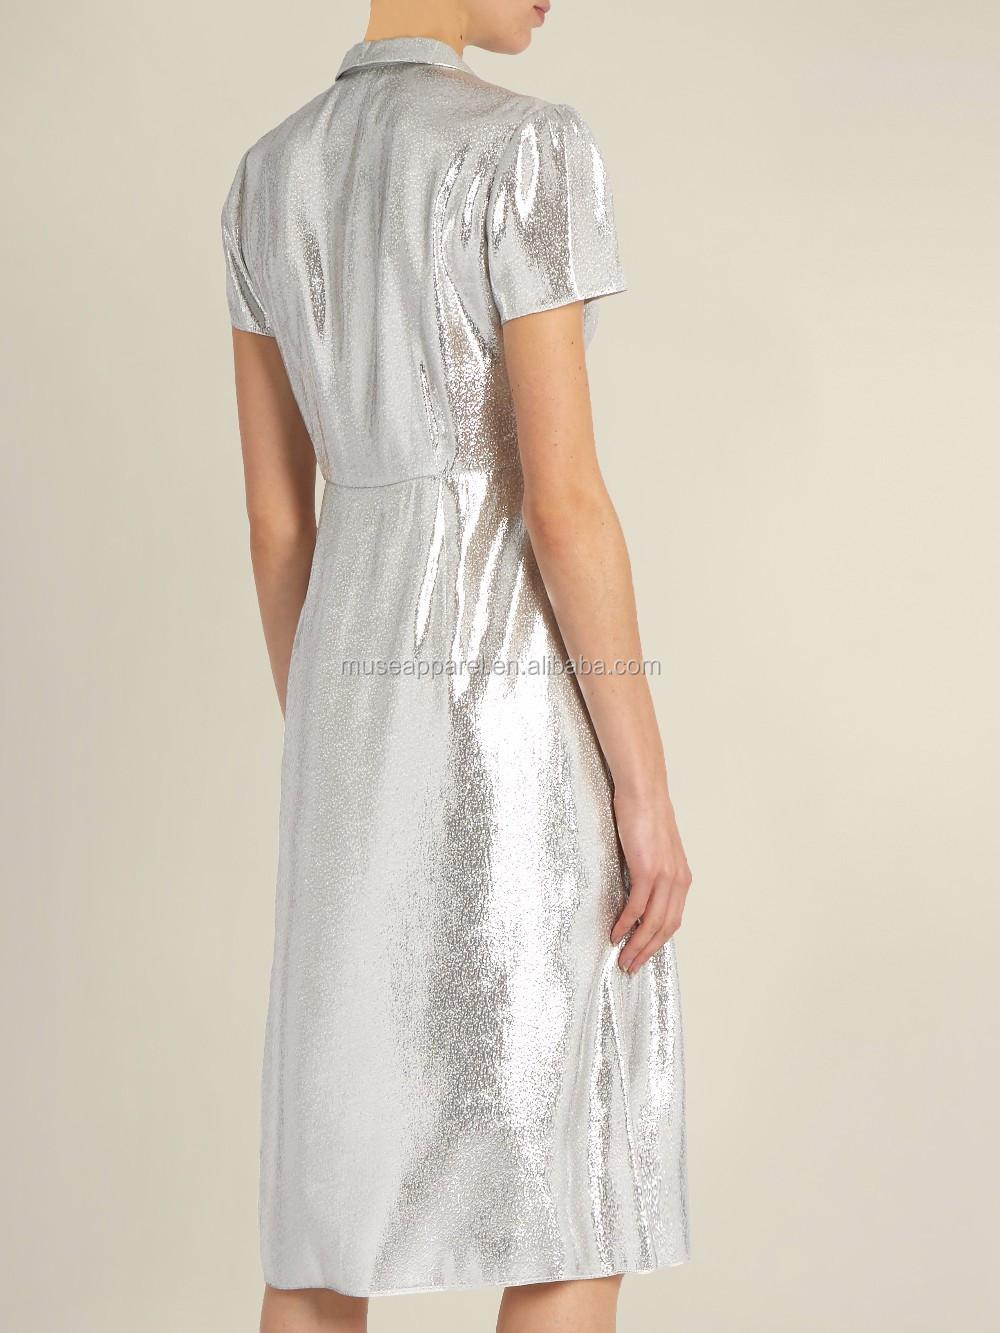 661158195e25 Silver Short Sleeved Lame Dress OEM/ODM Women Apparel Clothing Garment  Wholesaler Ropa Mujer